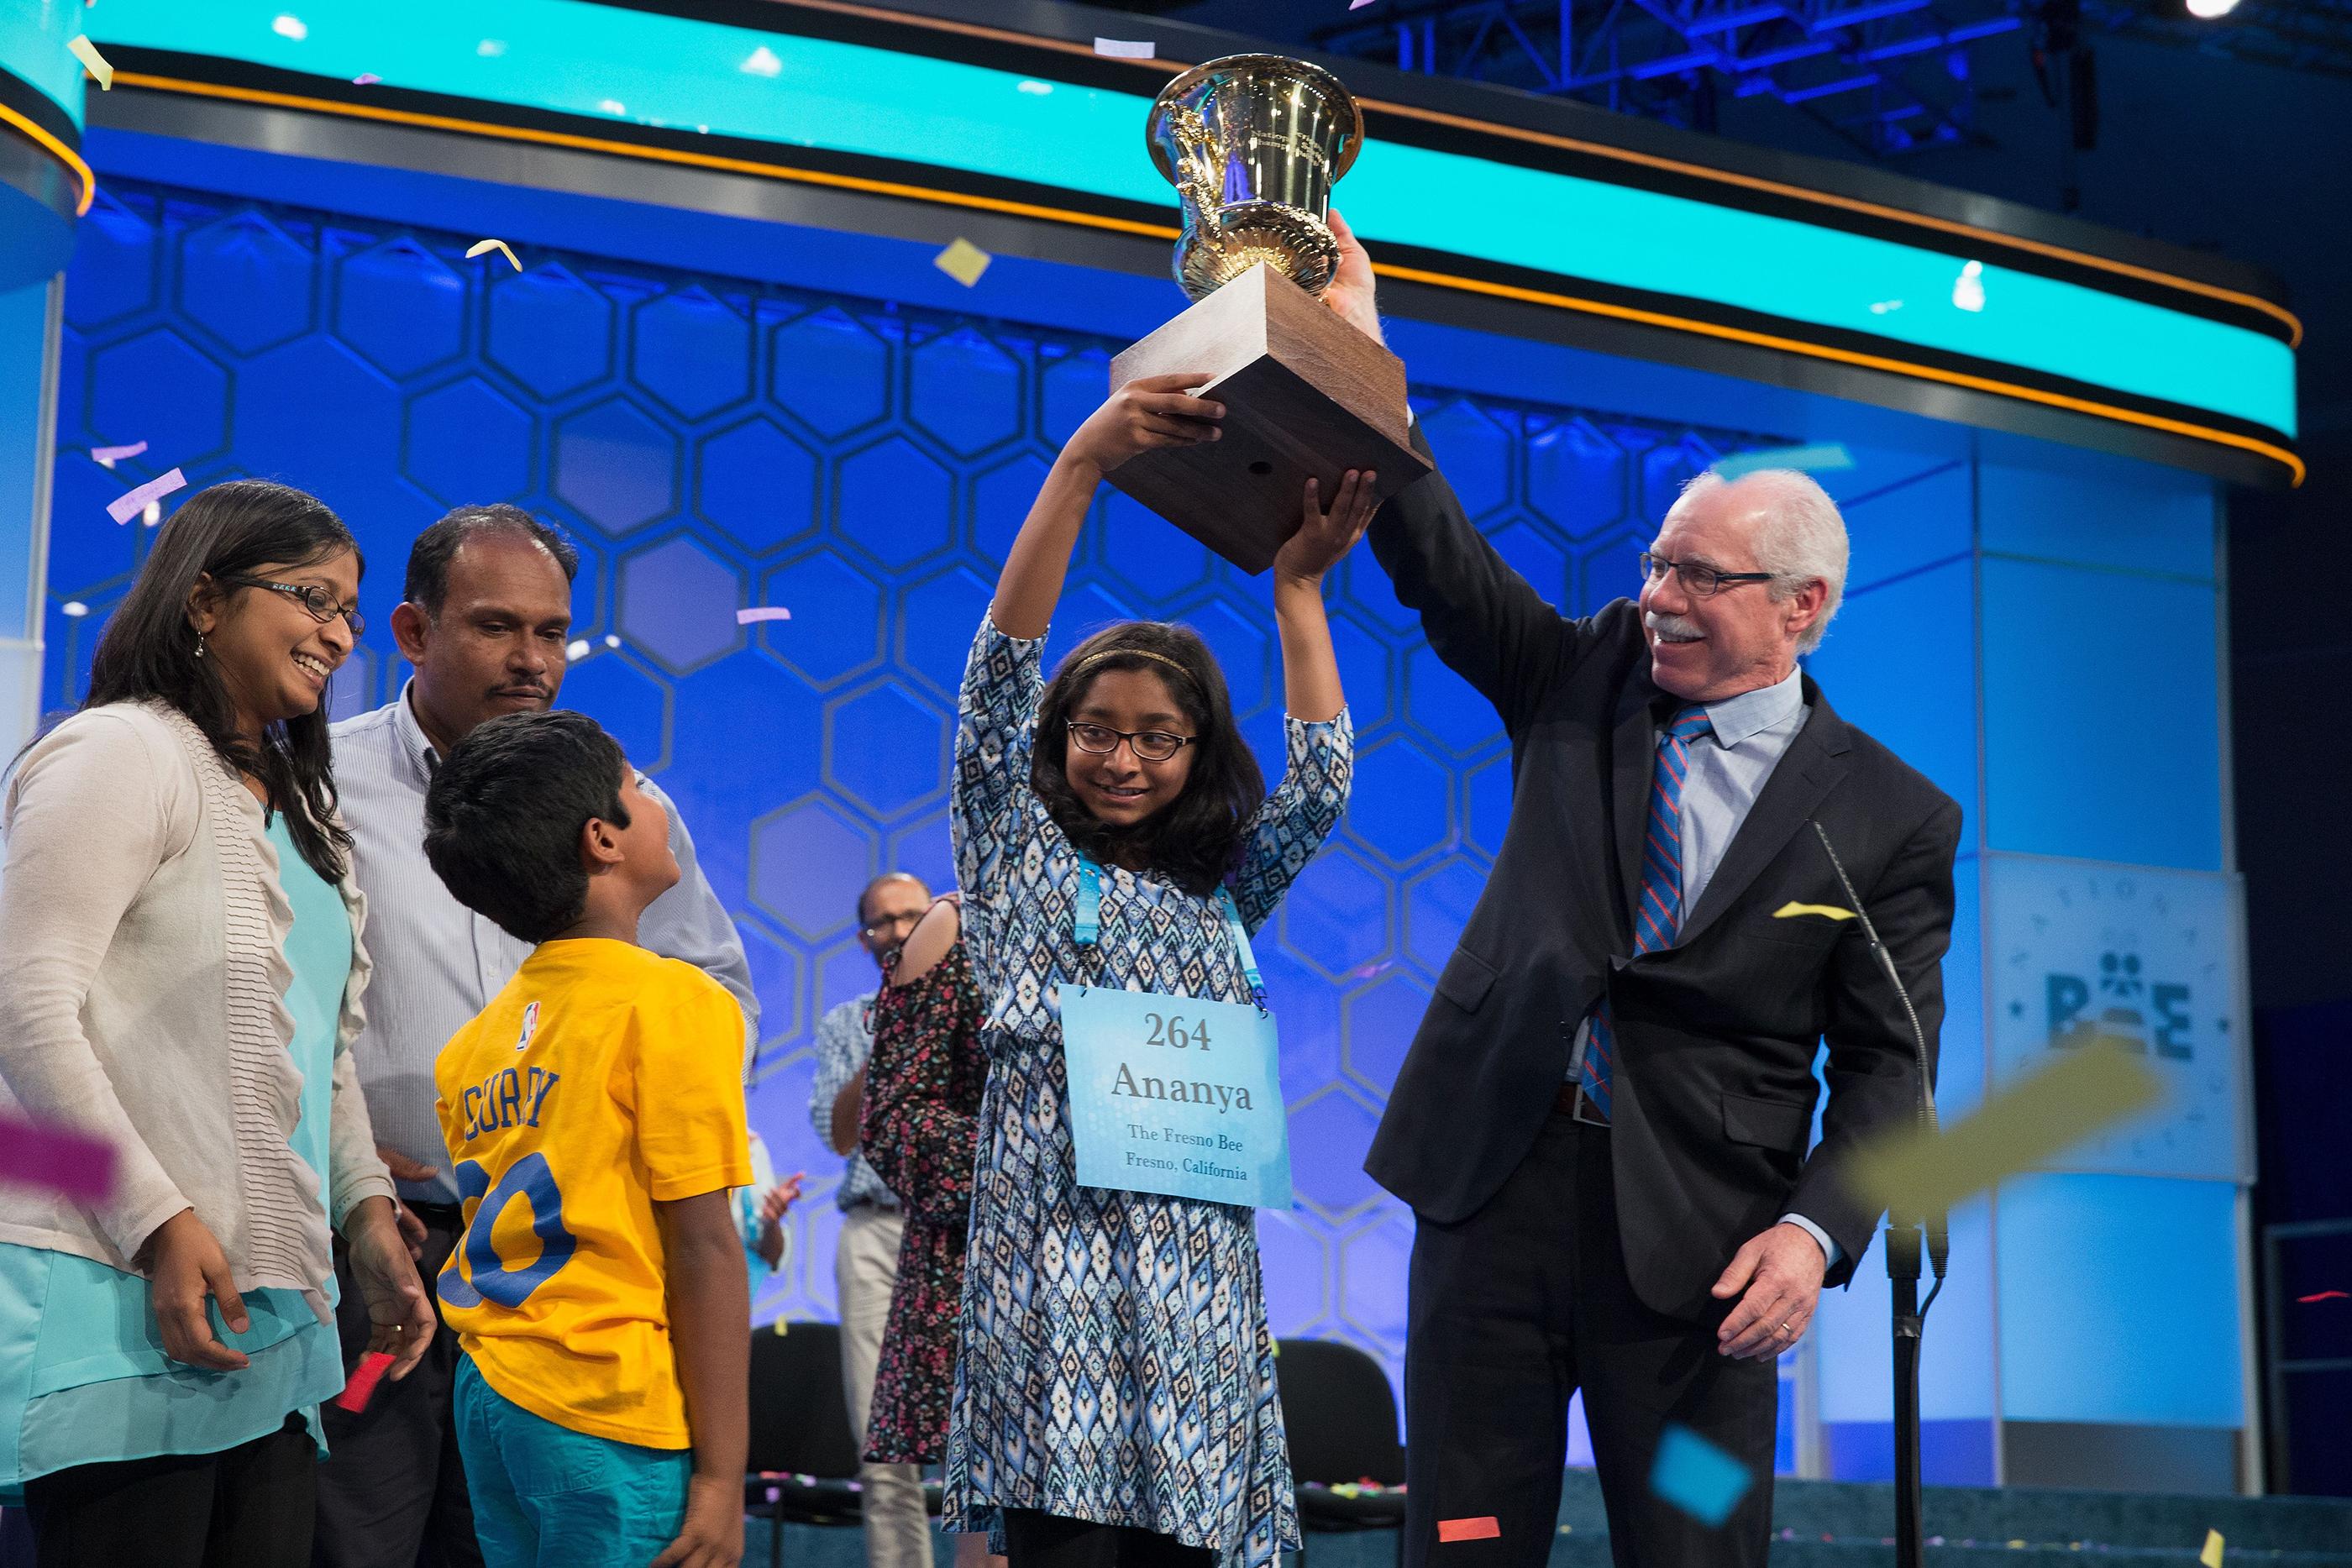 180529-raising-spelling-bee-champion-trophy